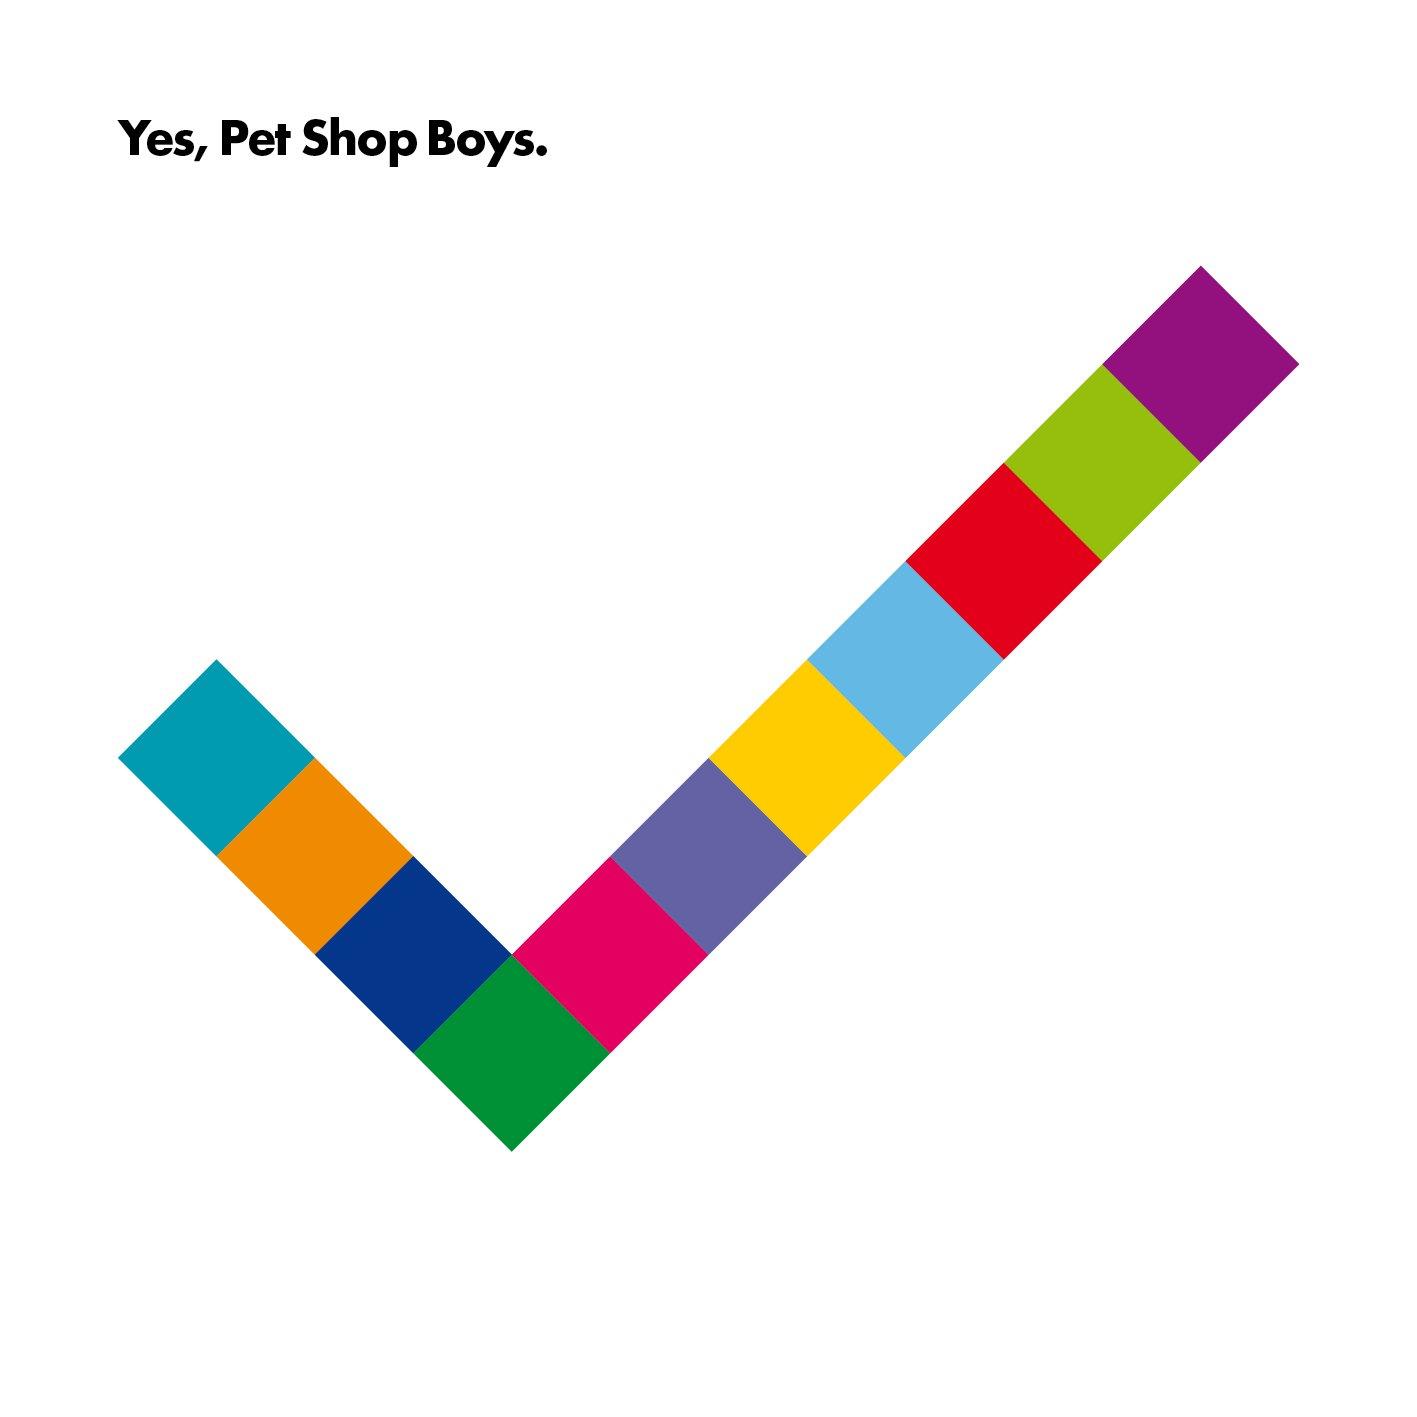 Pet Shop Boys, Yes